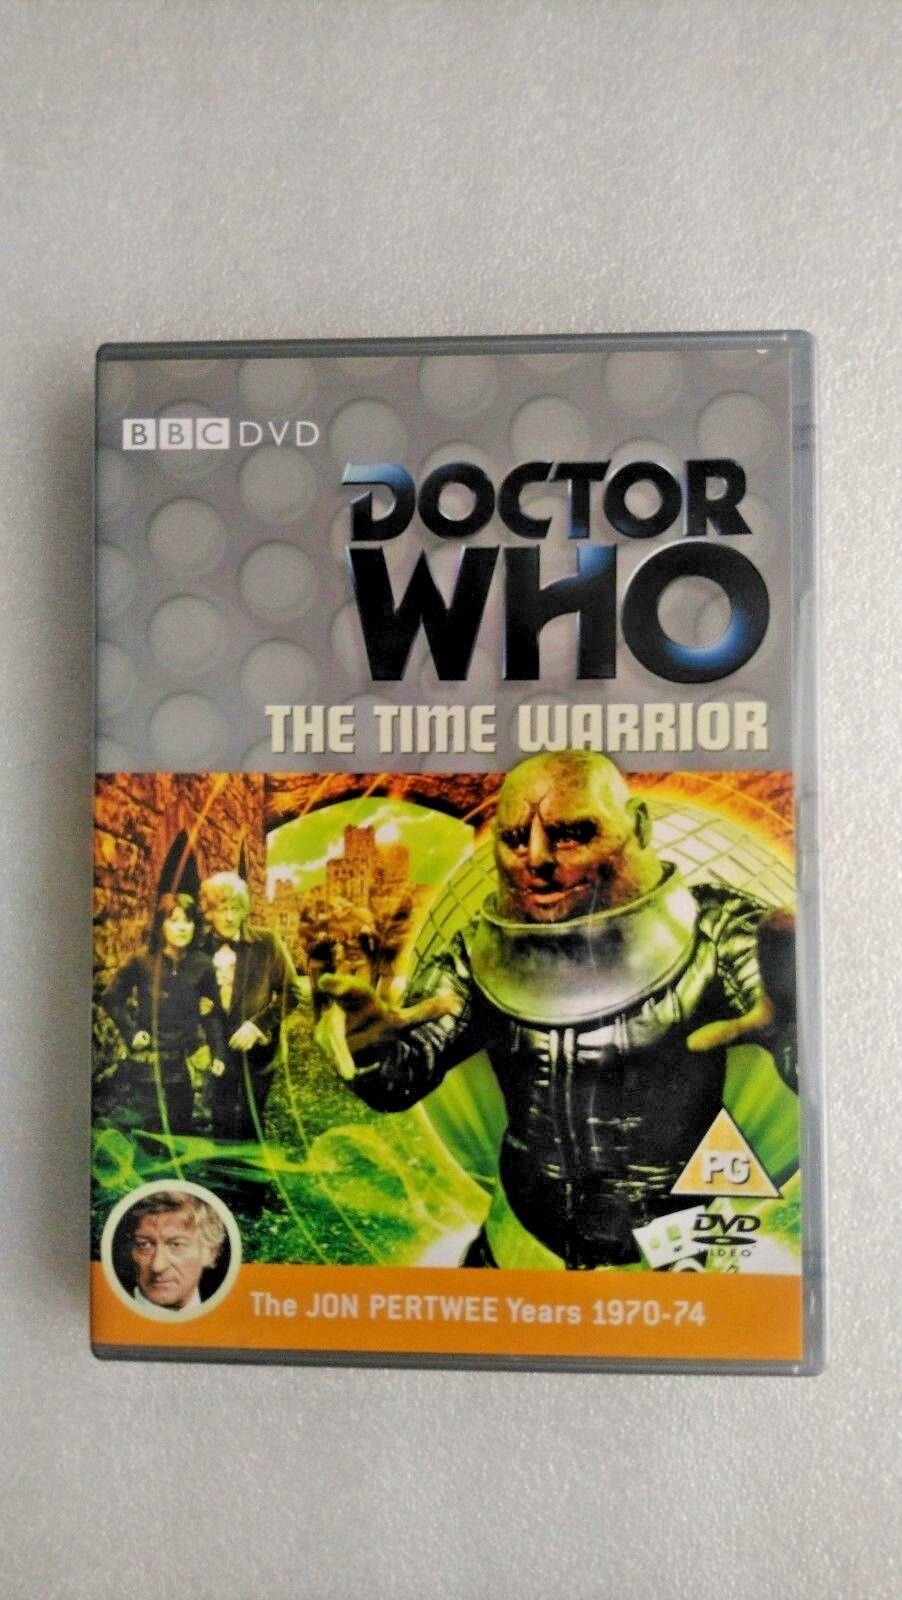 Doctor Who - Time Warrior (DVD, 2007) - Jon Pertwee